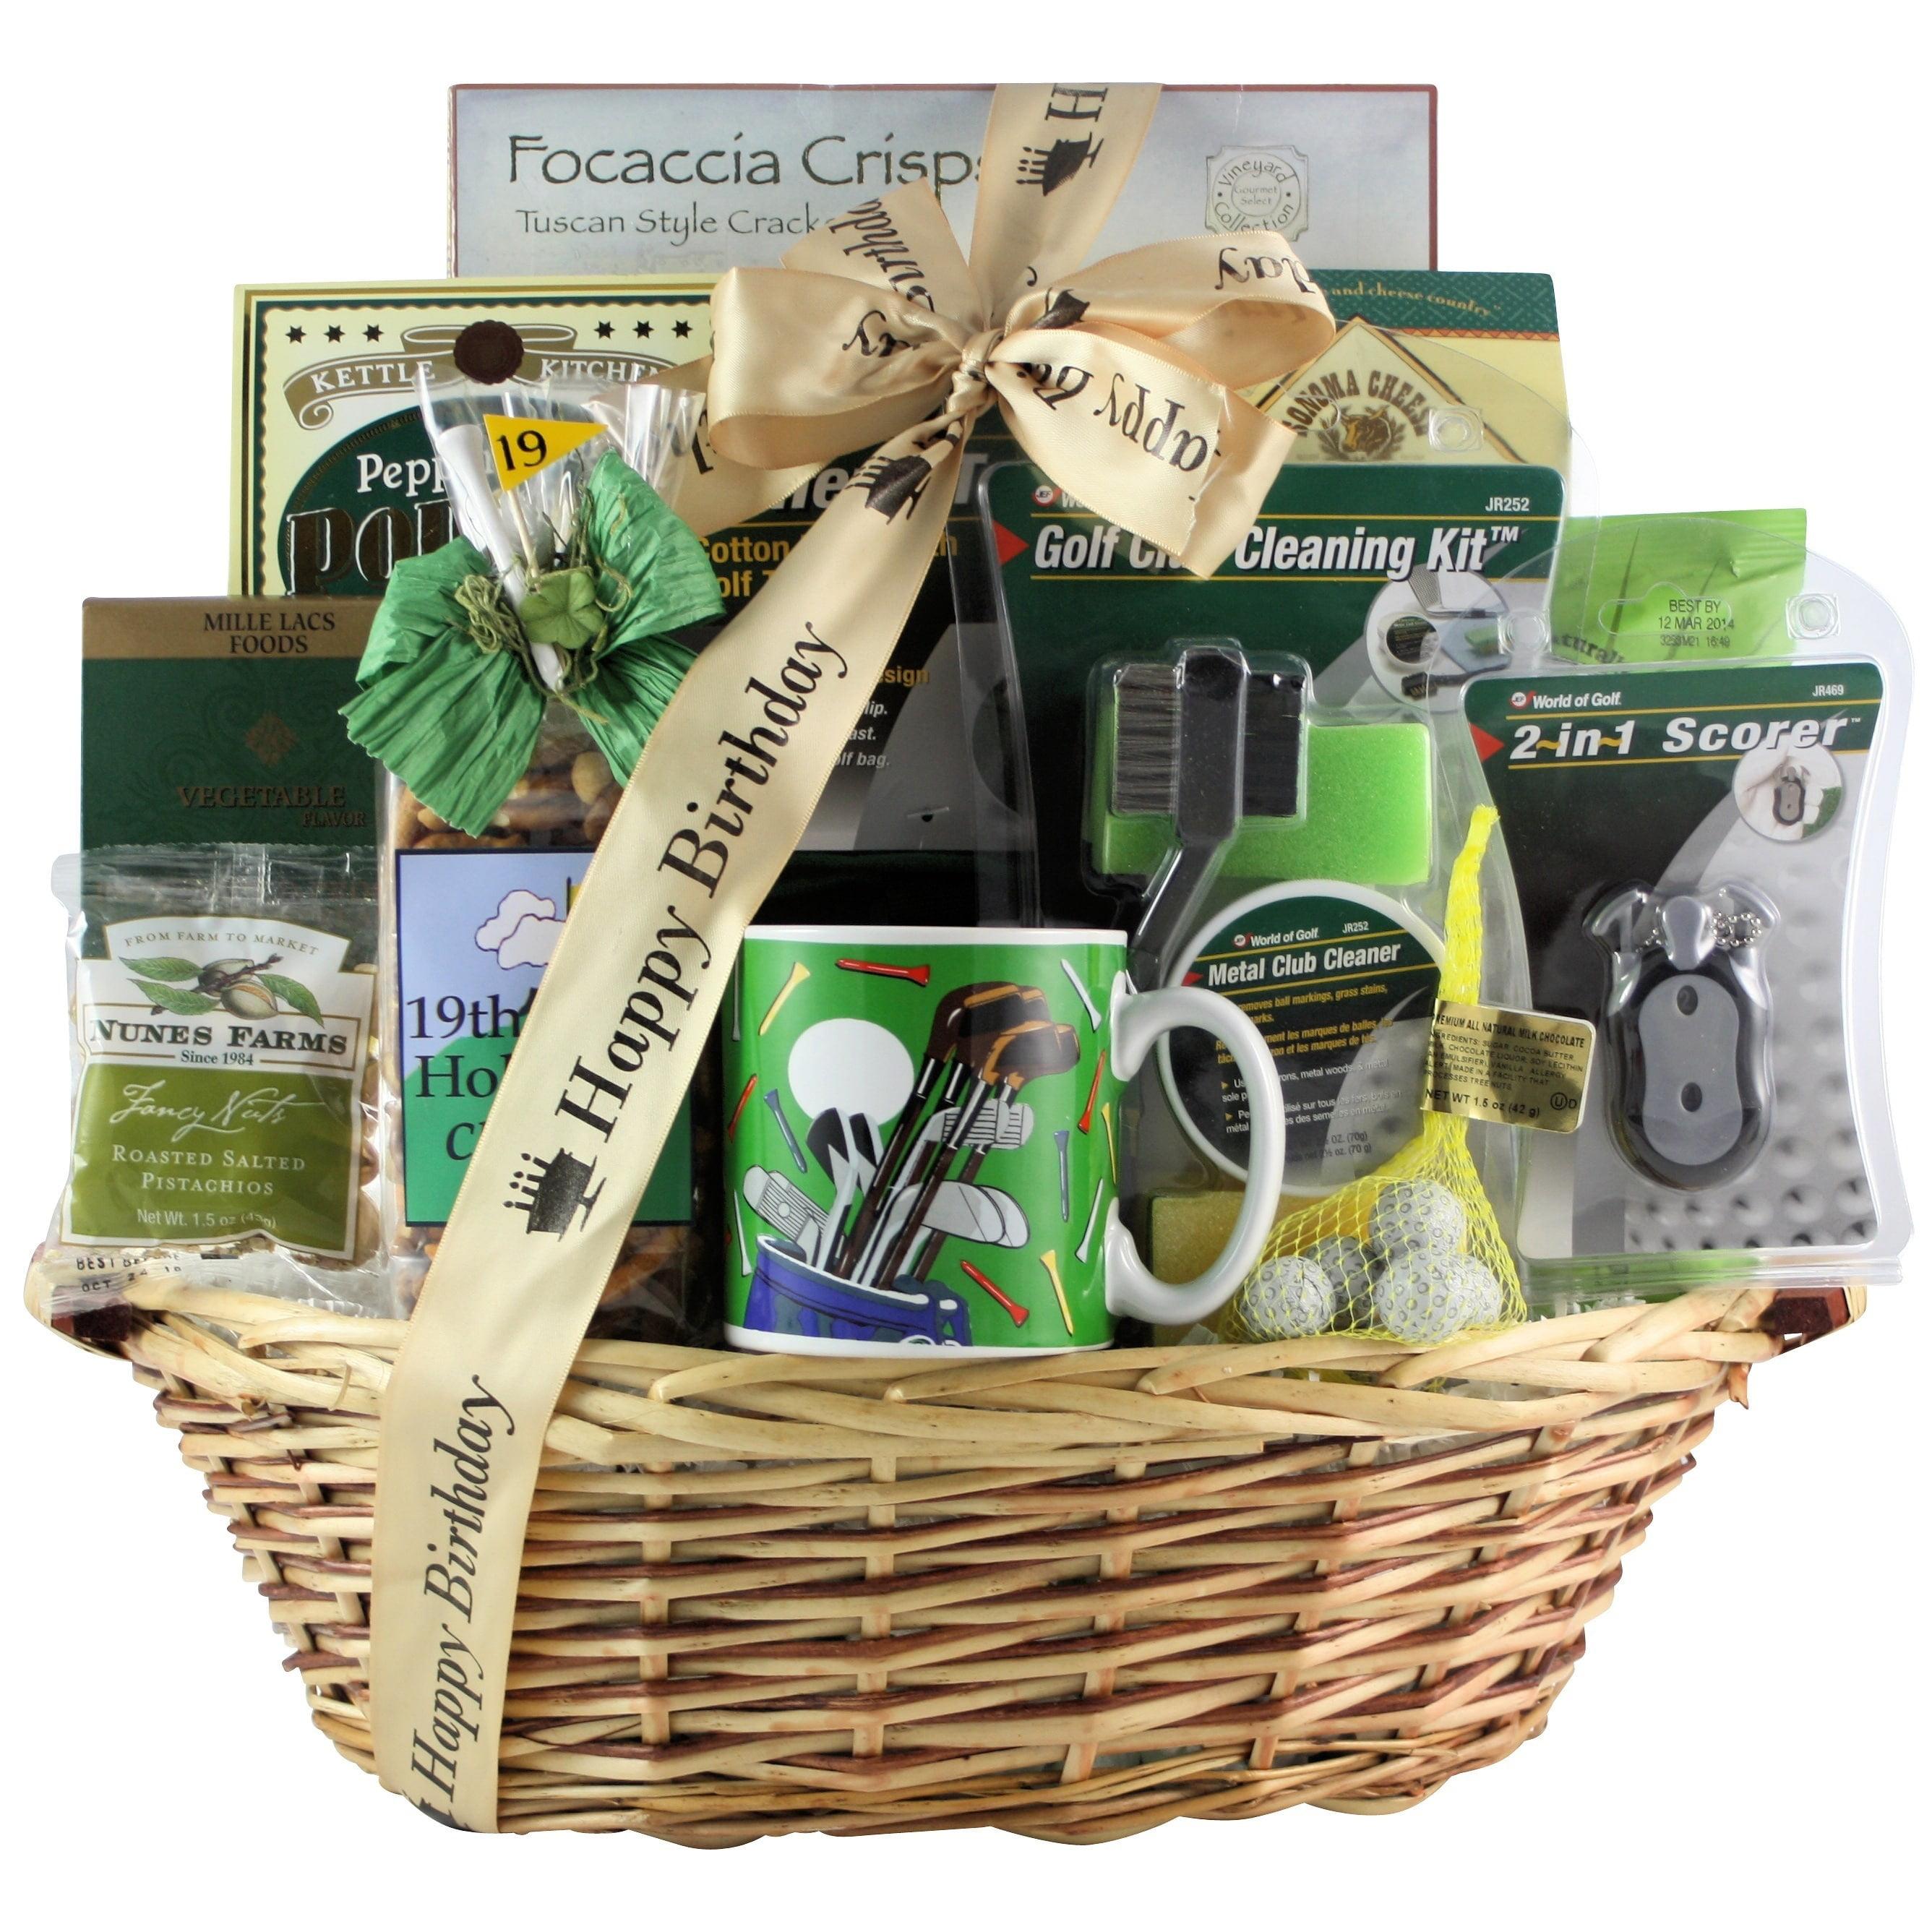 GreatArrivals Gift Baskets Golfers Delight Birthday Basket